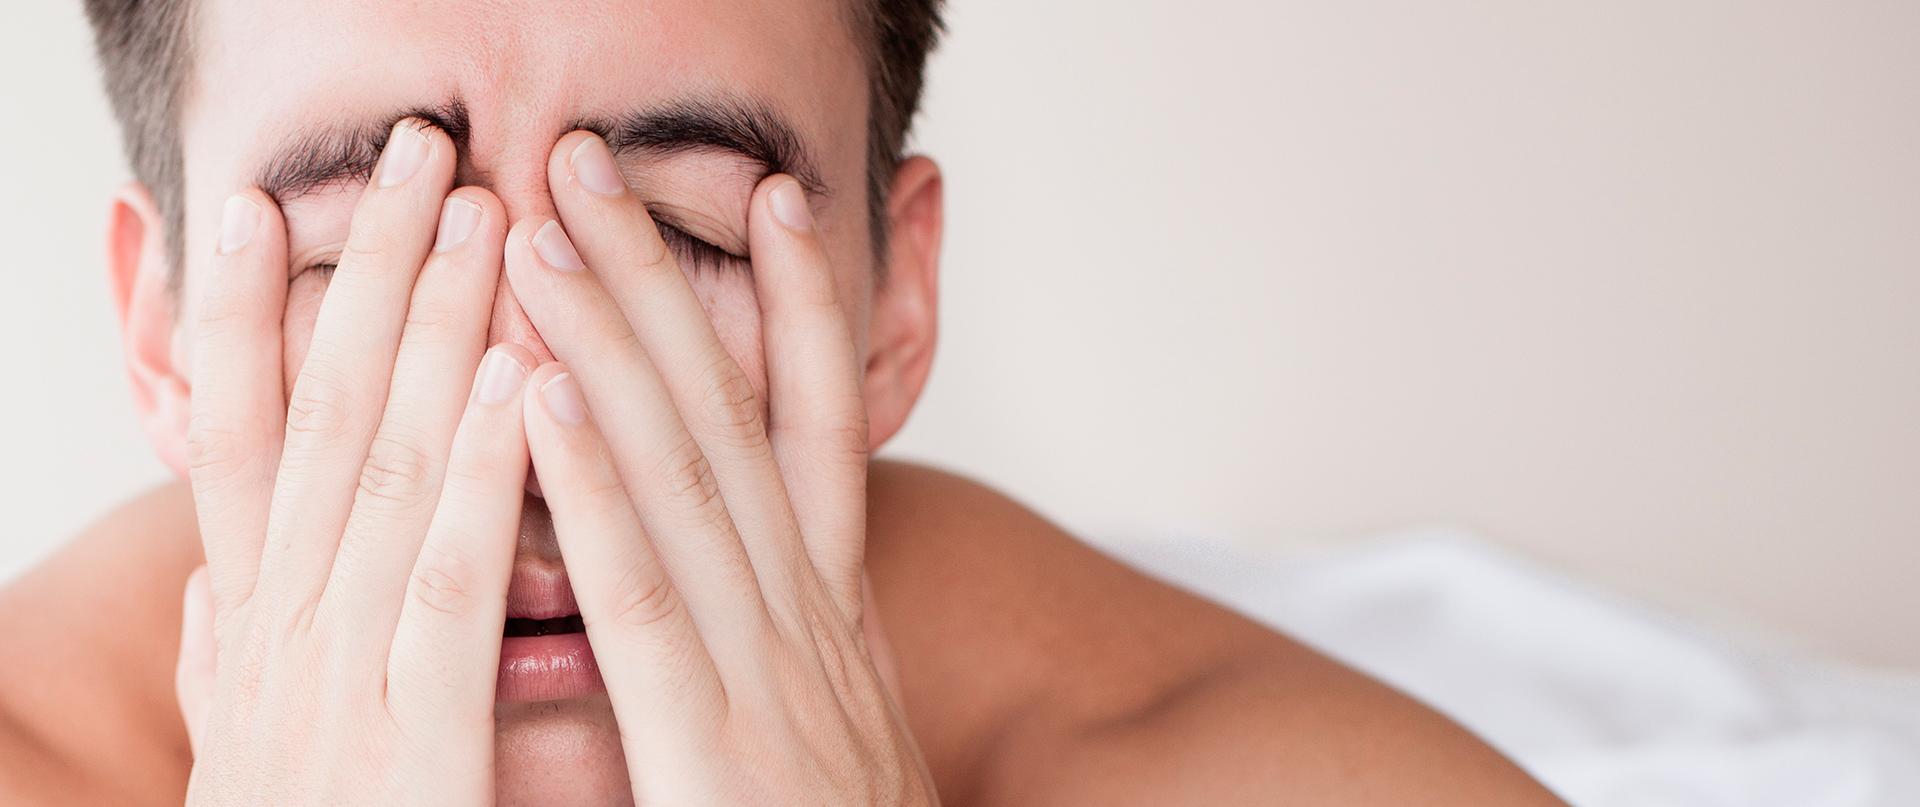 ¿Te levantas agotado? ¿Duermes mal?